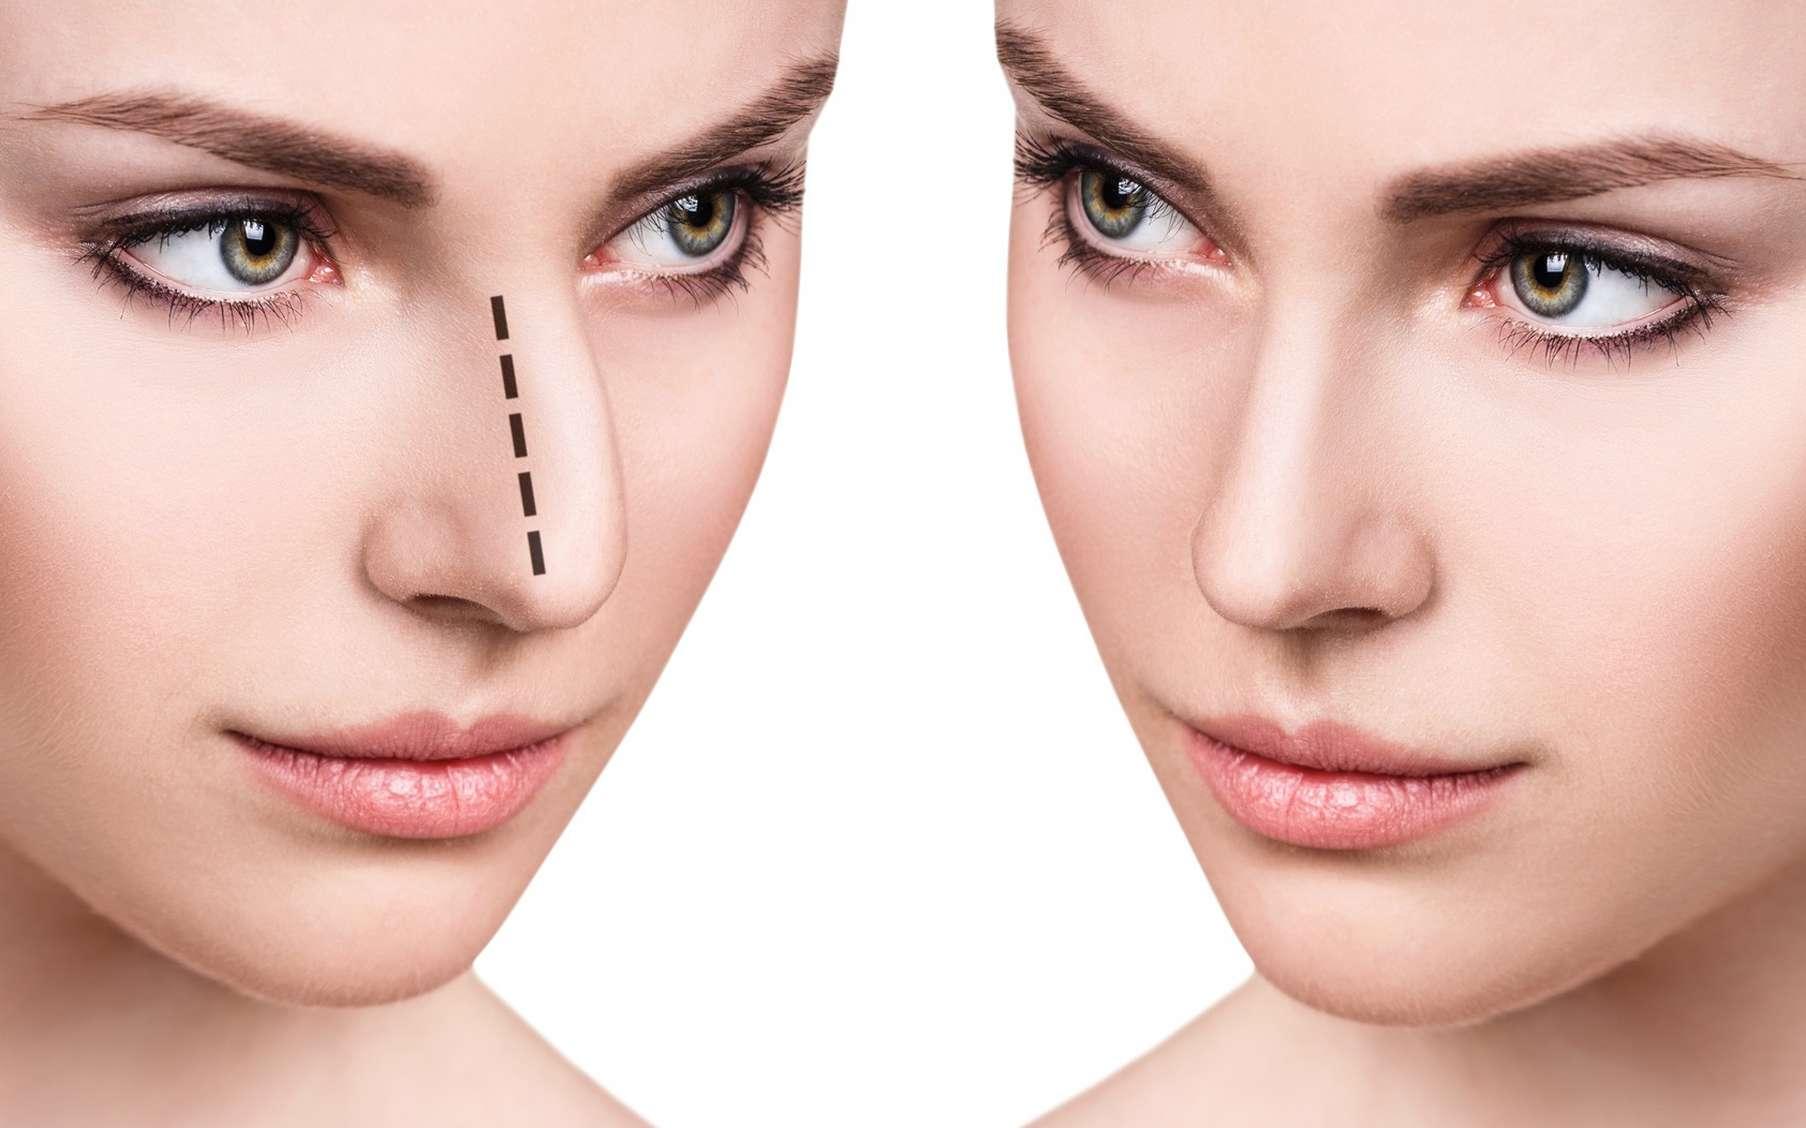 rhinoplastie-chirurgie-esthétique-plastique-prix-tunisie-fontionnelle-nez-operation